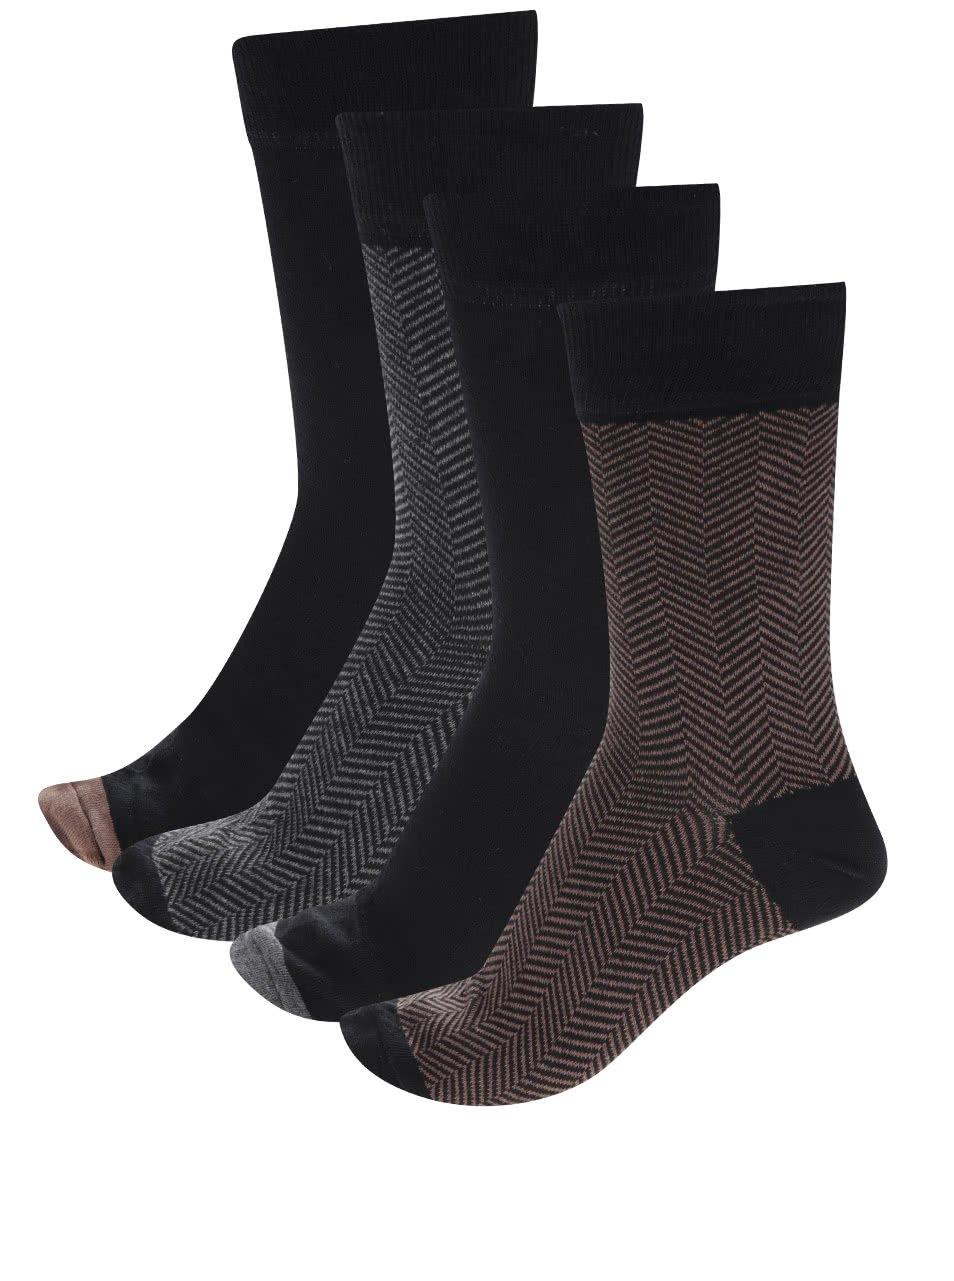 Sada čtyř párů vzorovaných ponožek v černé, hnědé a šedé barvě Burton Menswear London